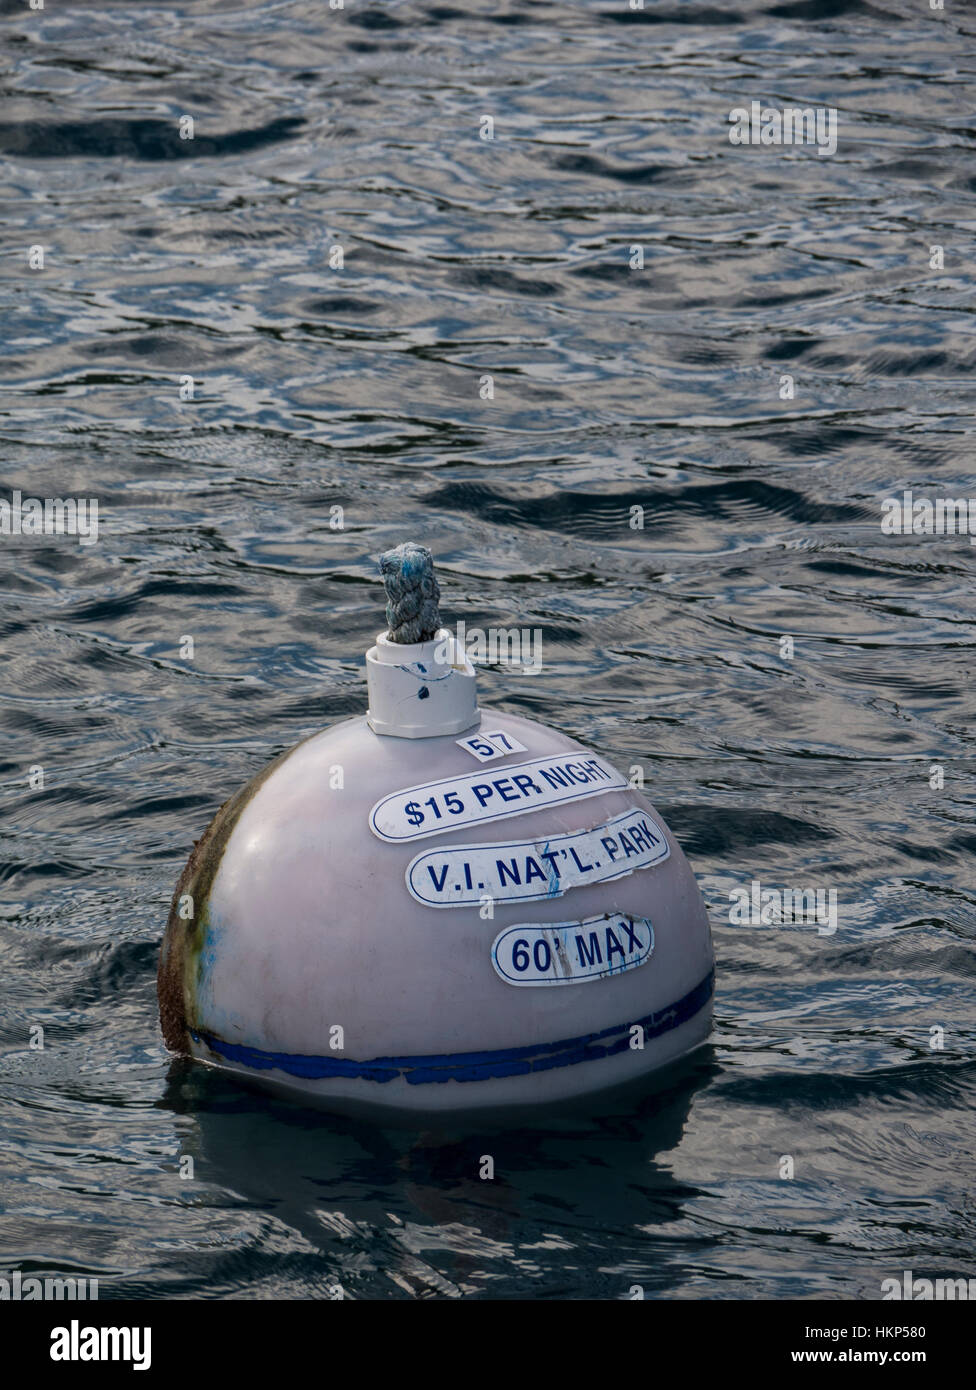 Mooring float, Leinster Bay, Virgin Islands National Park, St. John Island, U.S. Virgin Islands. - Stock Image